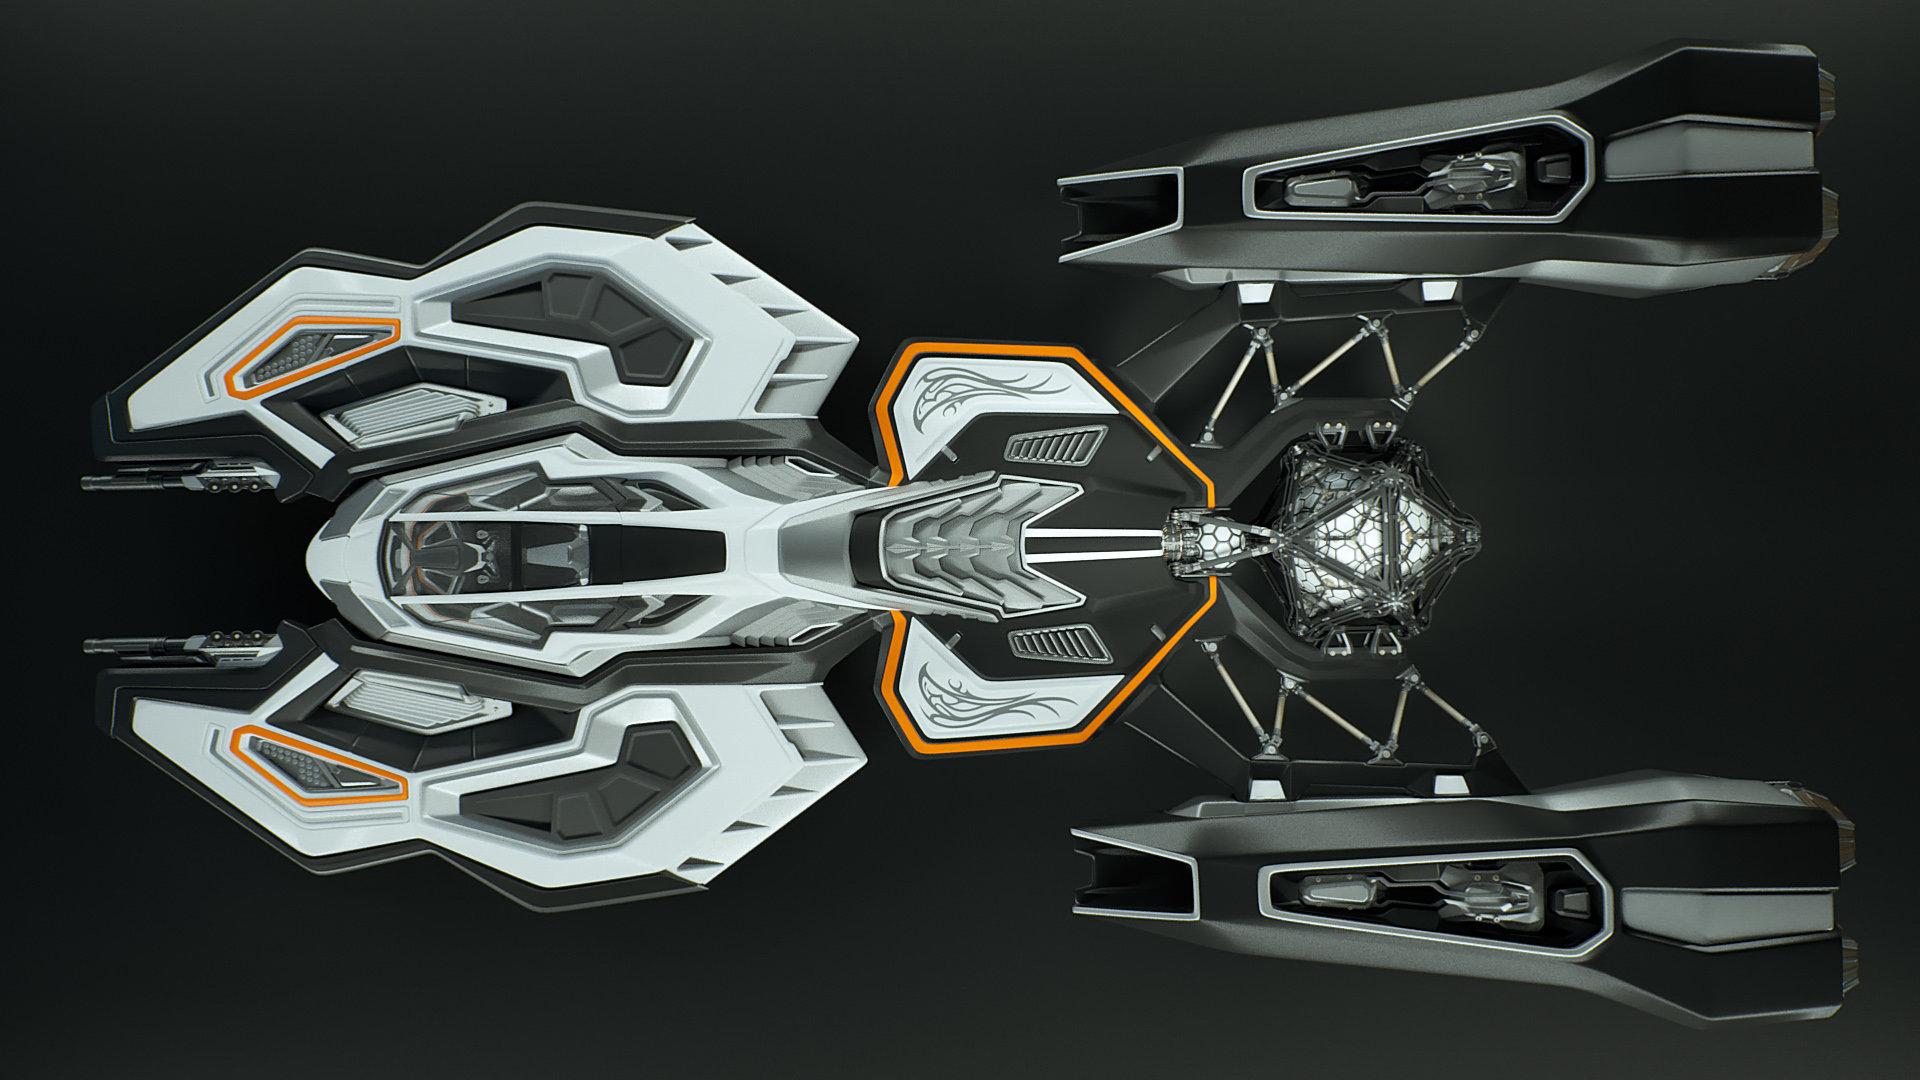 Johan de leenheer 3d spaceship faucer fuga mx230e 01